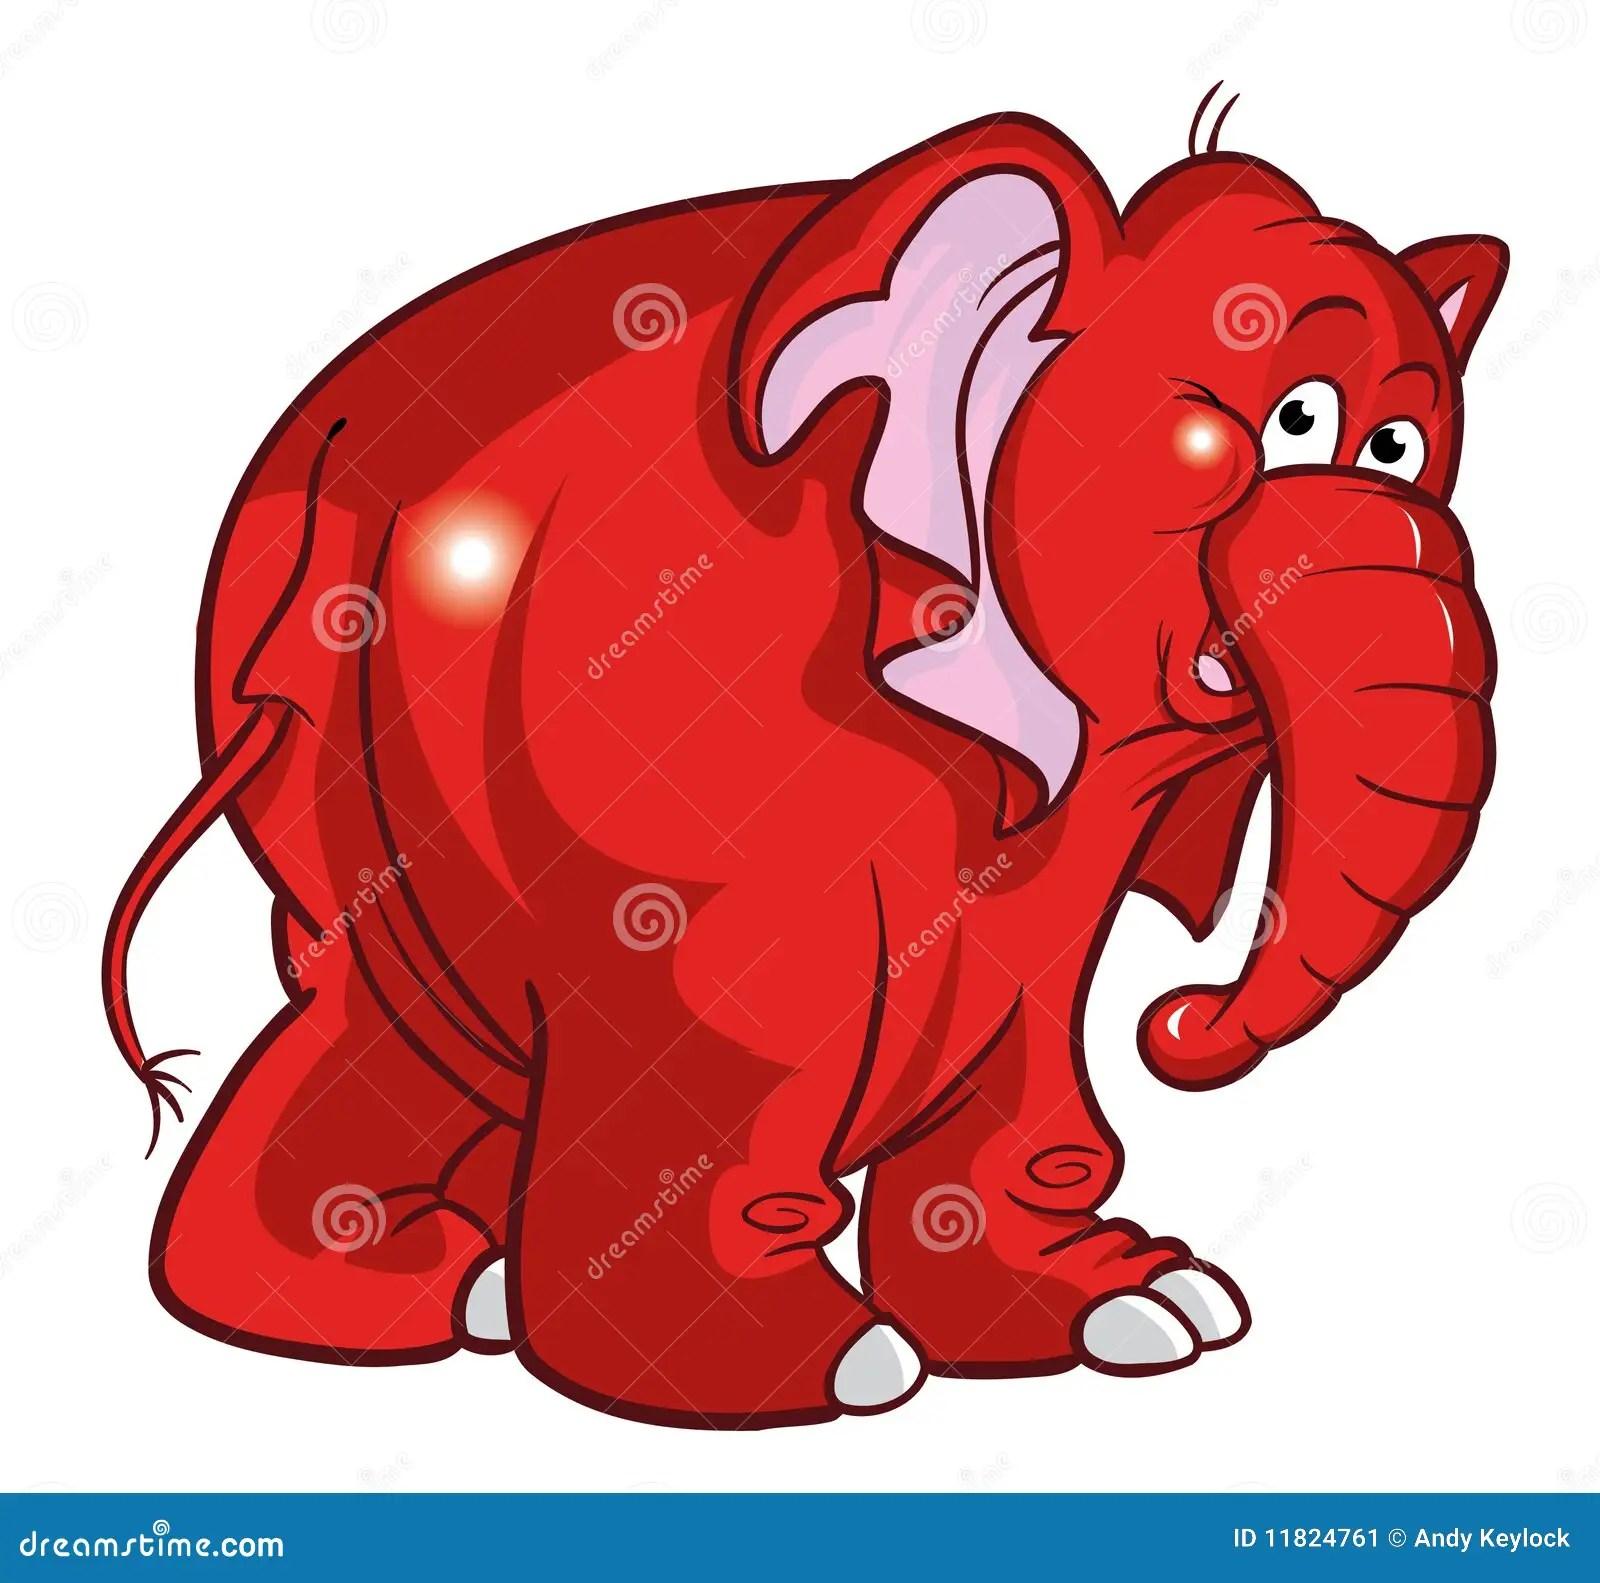 Elephant Trunk Drawings